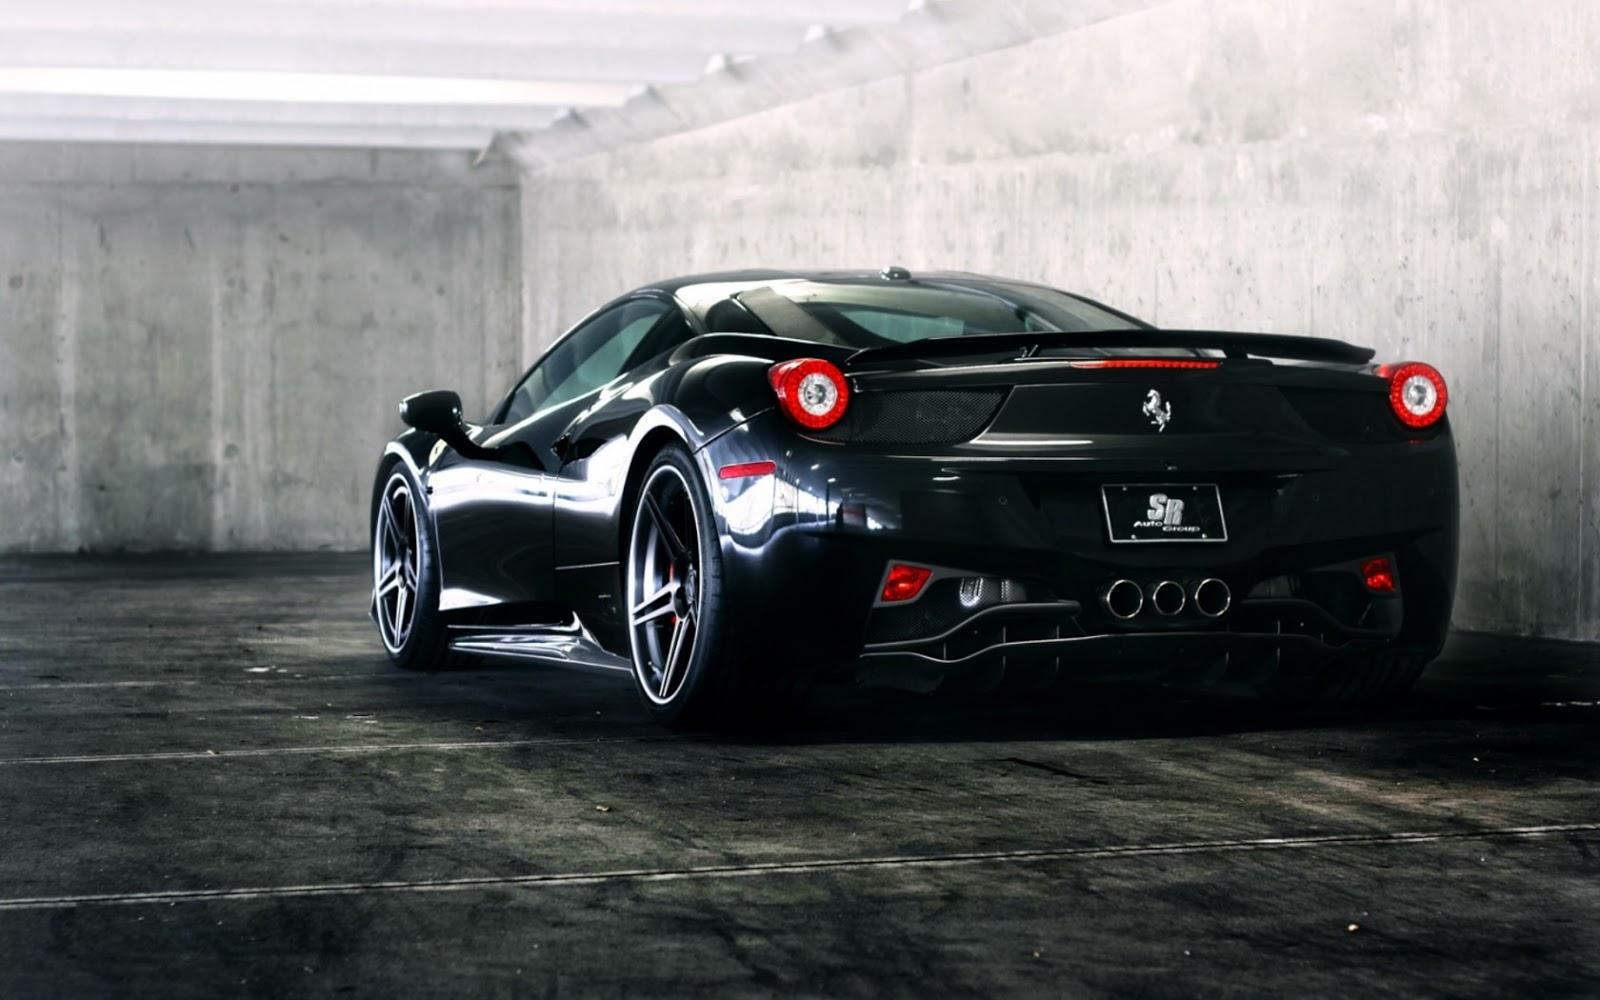 http://4.bp.blogspot.com/-OYweKQCkVk8/UQPkMkcjtXI/AAAAAAAAAoI/W_RHC-BTntg/s1600/Ferrari+458+Italia+Wallpaper.jpg